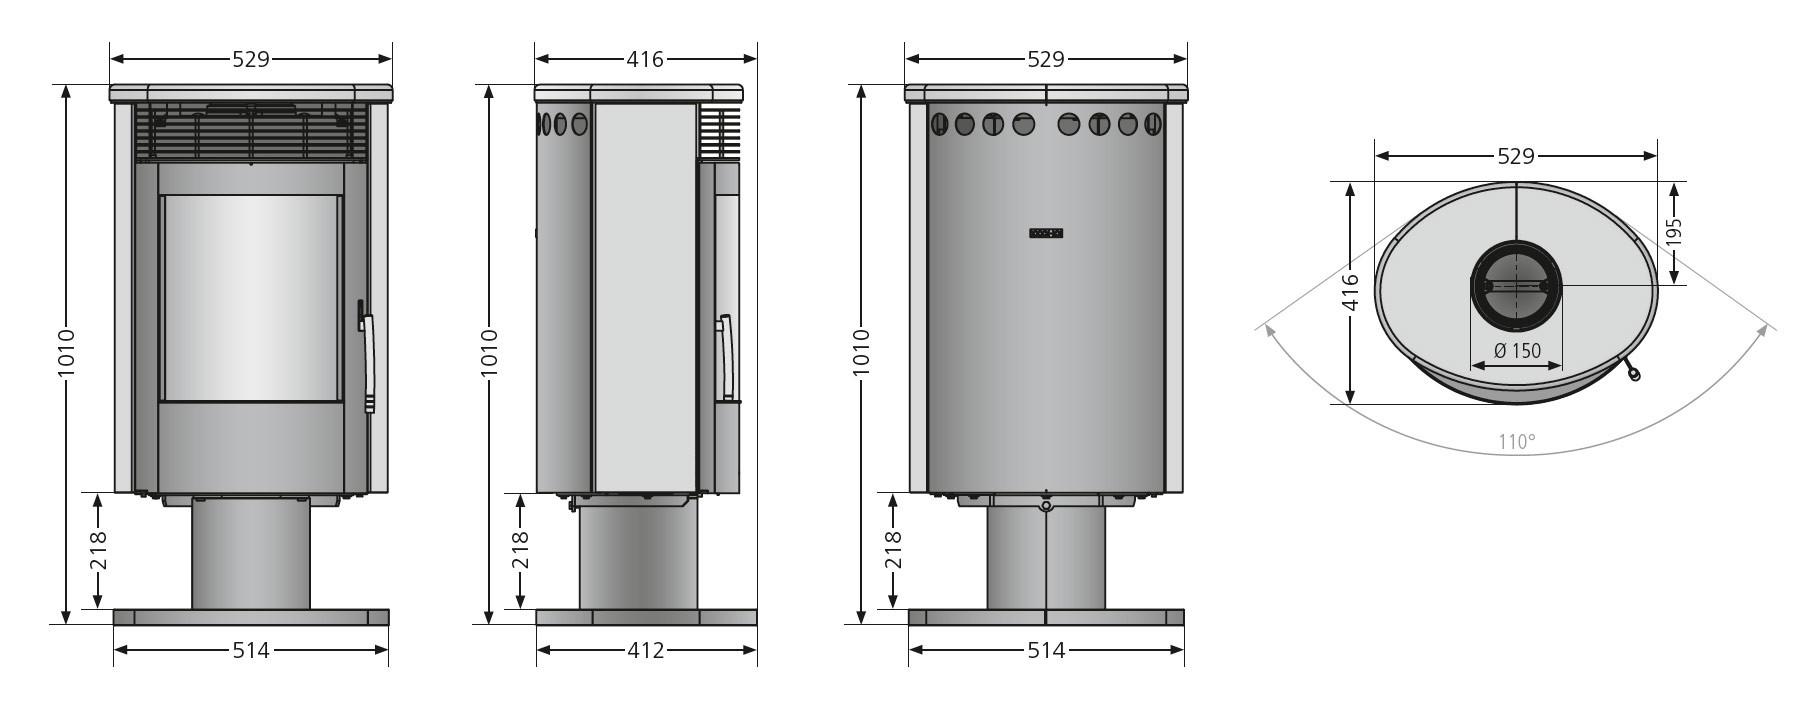 Kaminofen Justus Seeland raumluftunabhängig drehbar Sandstein 5kW Bild 2